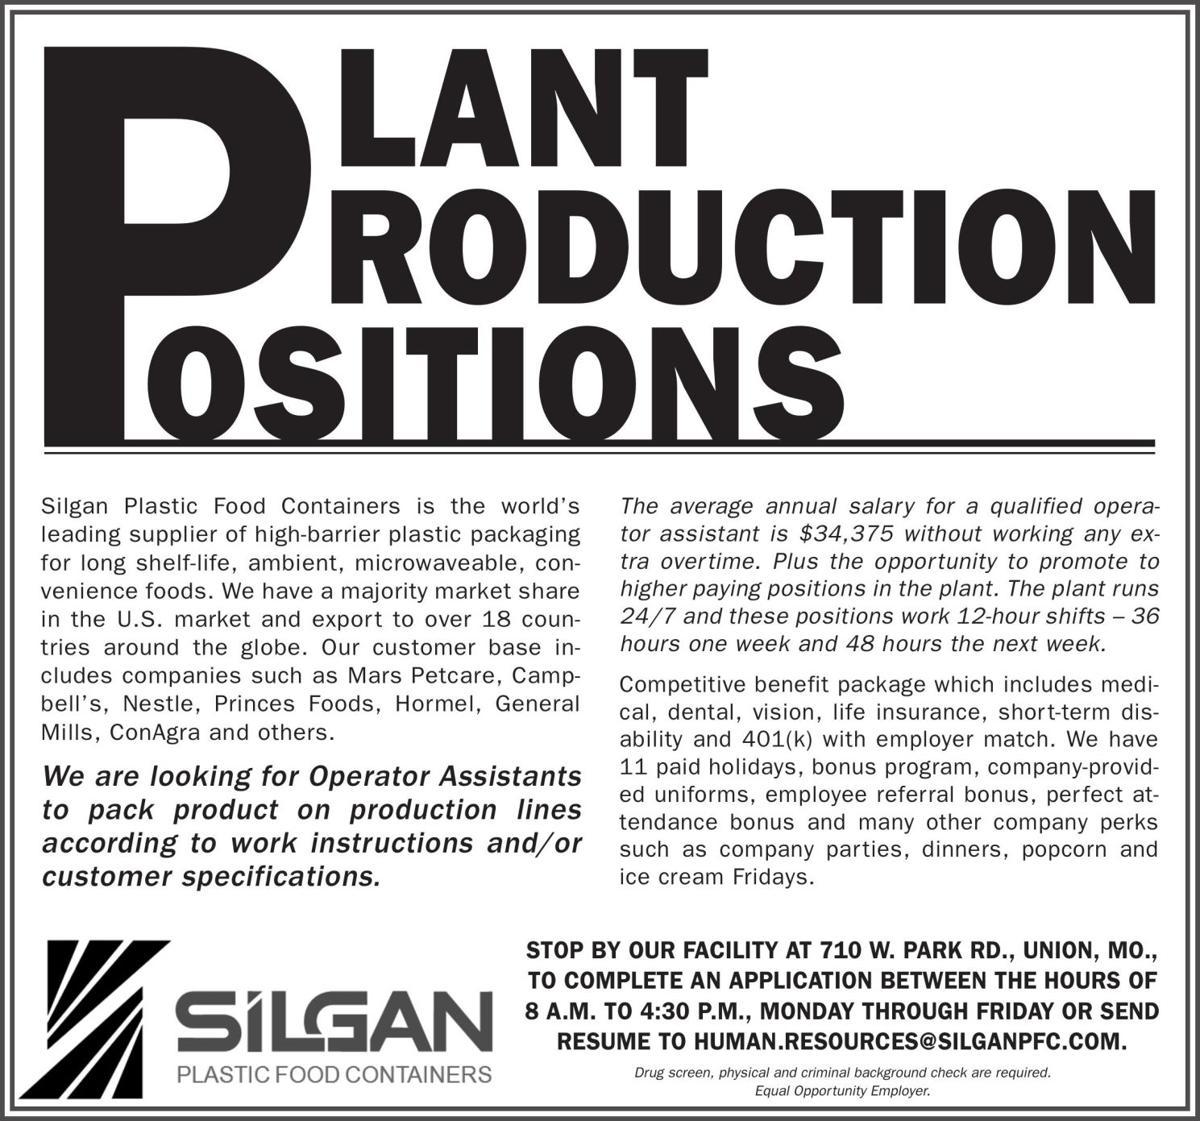 PLANT PRODUCTION POSITIONS